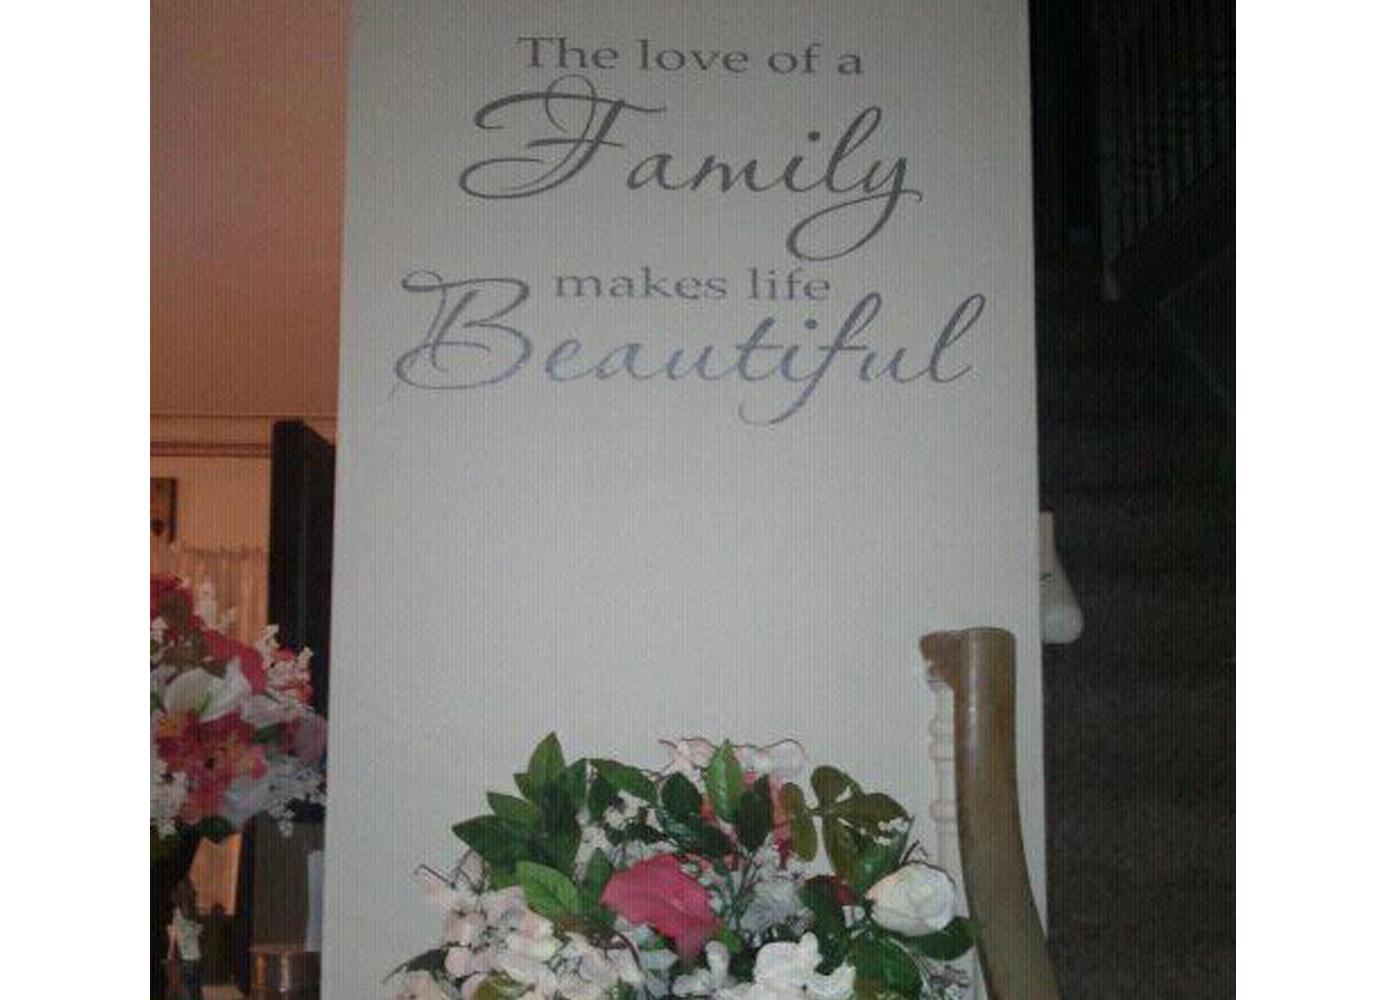 family-makes-life-beautiful-silver-wall-decal-saying.jpg